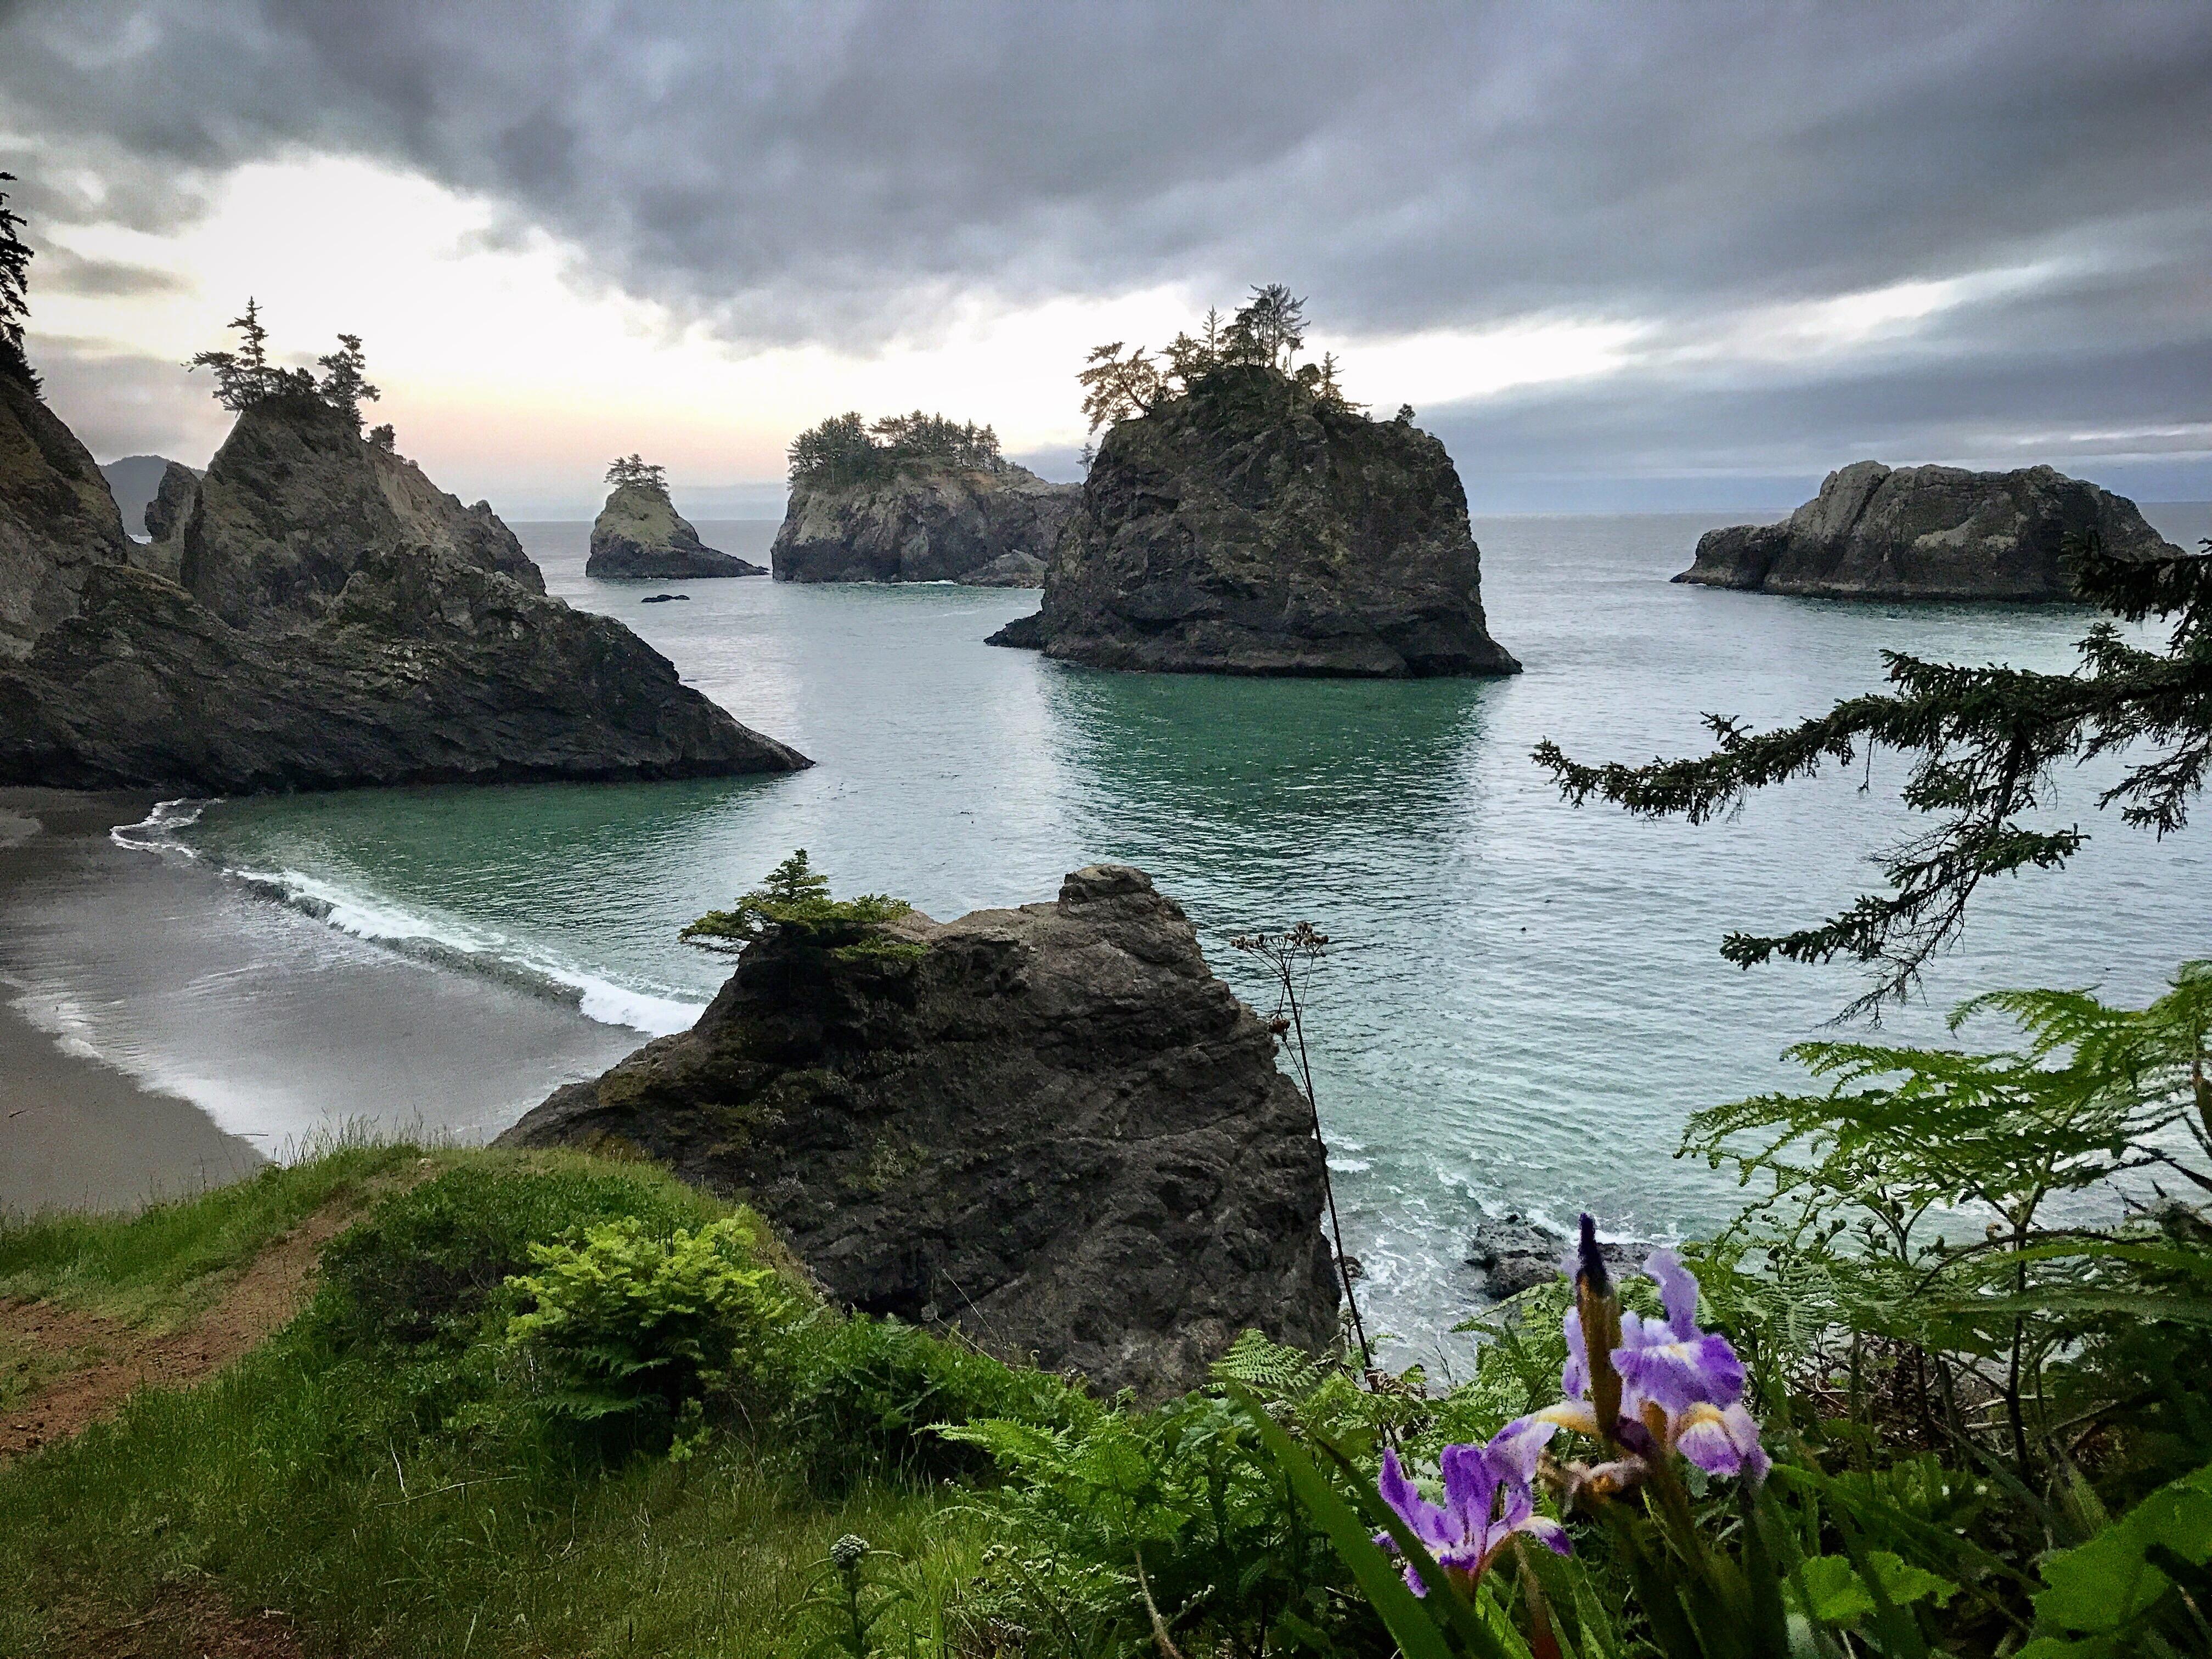 Oregon Coastline — sea stacks dot the ocean on a rugged coast